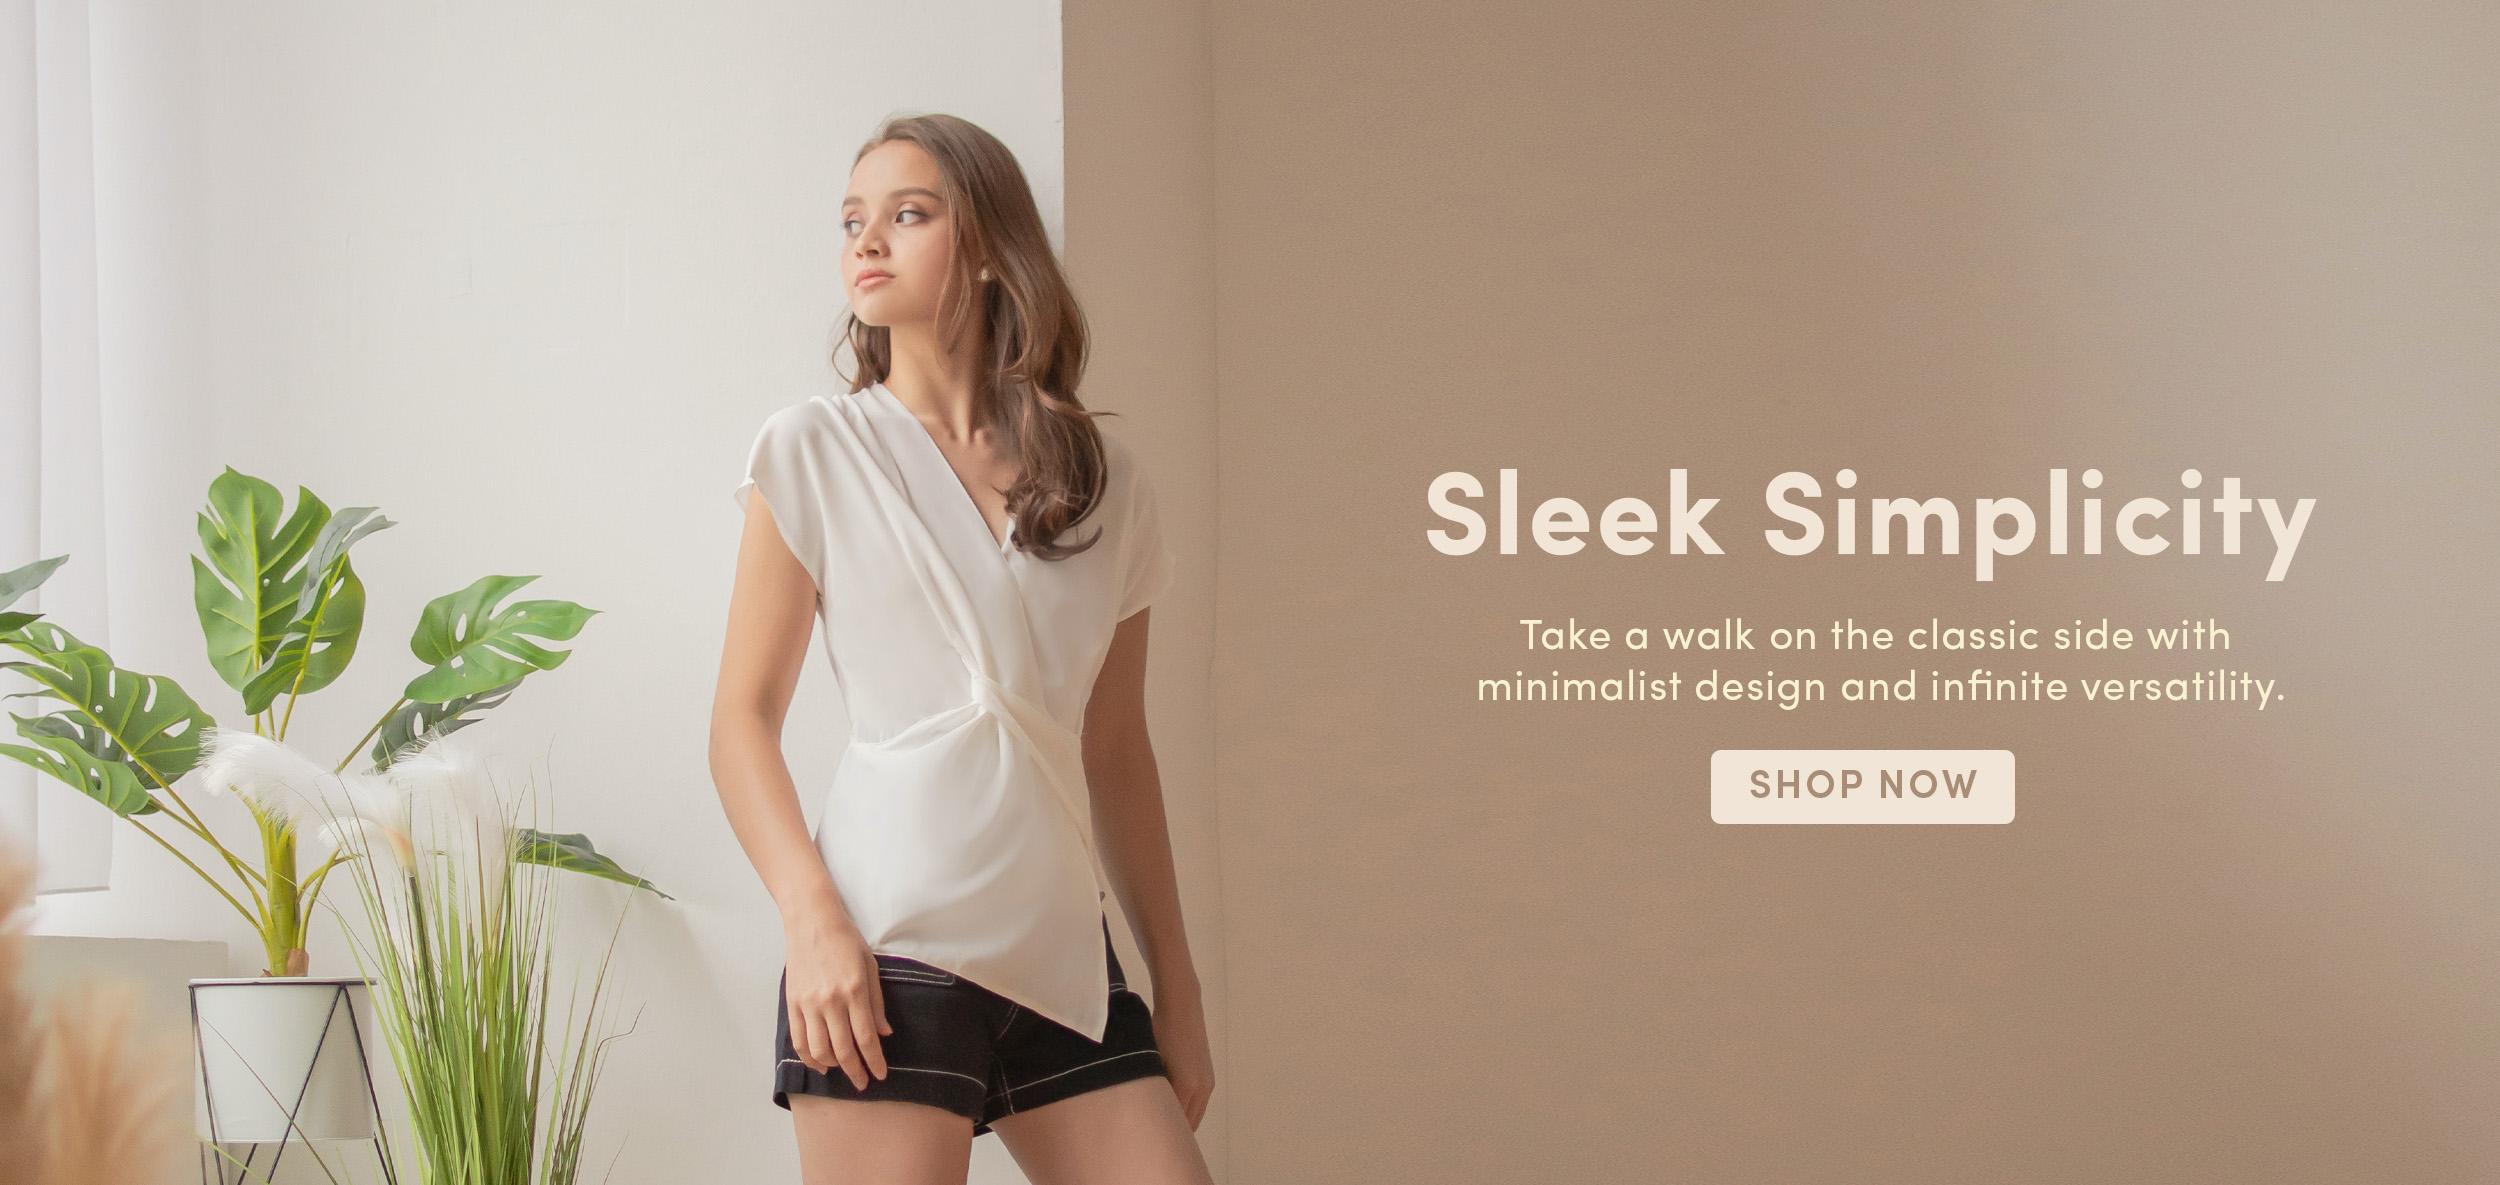 Sleek Simplicity